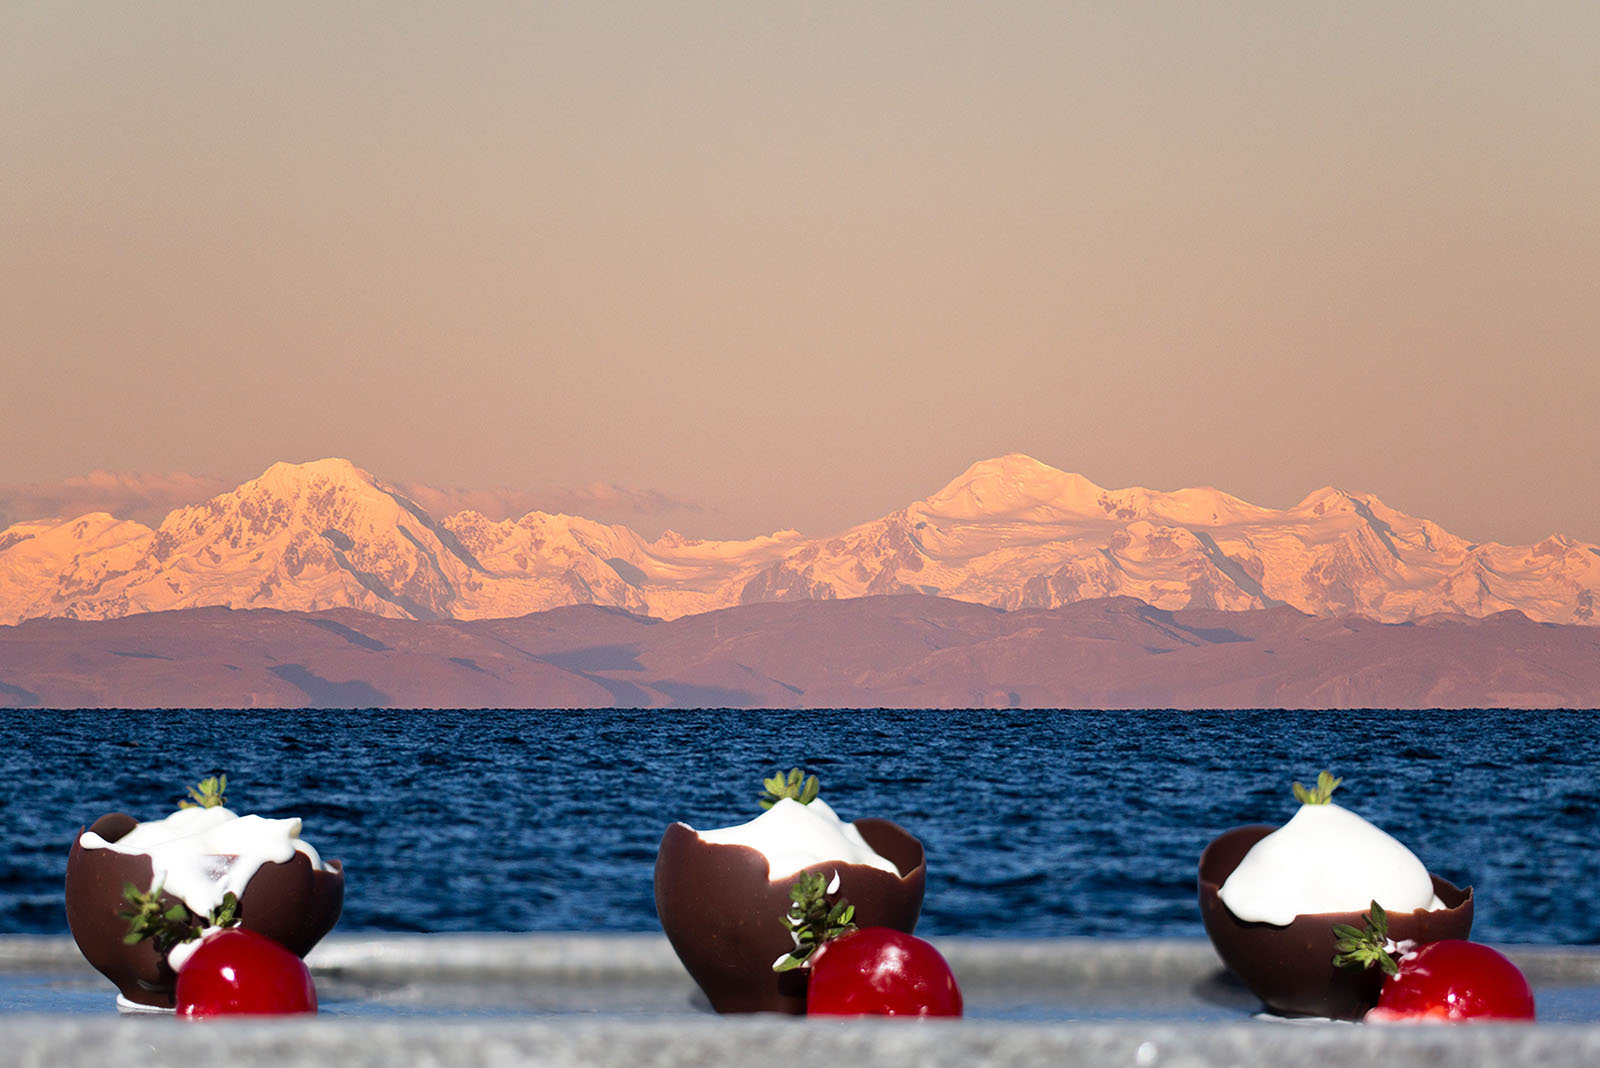 amantika-lodge-andes-mountain-view